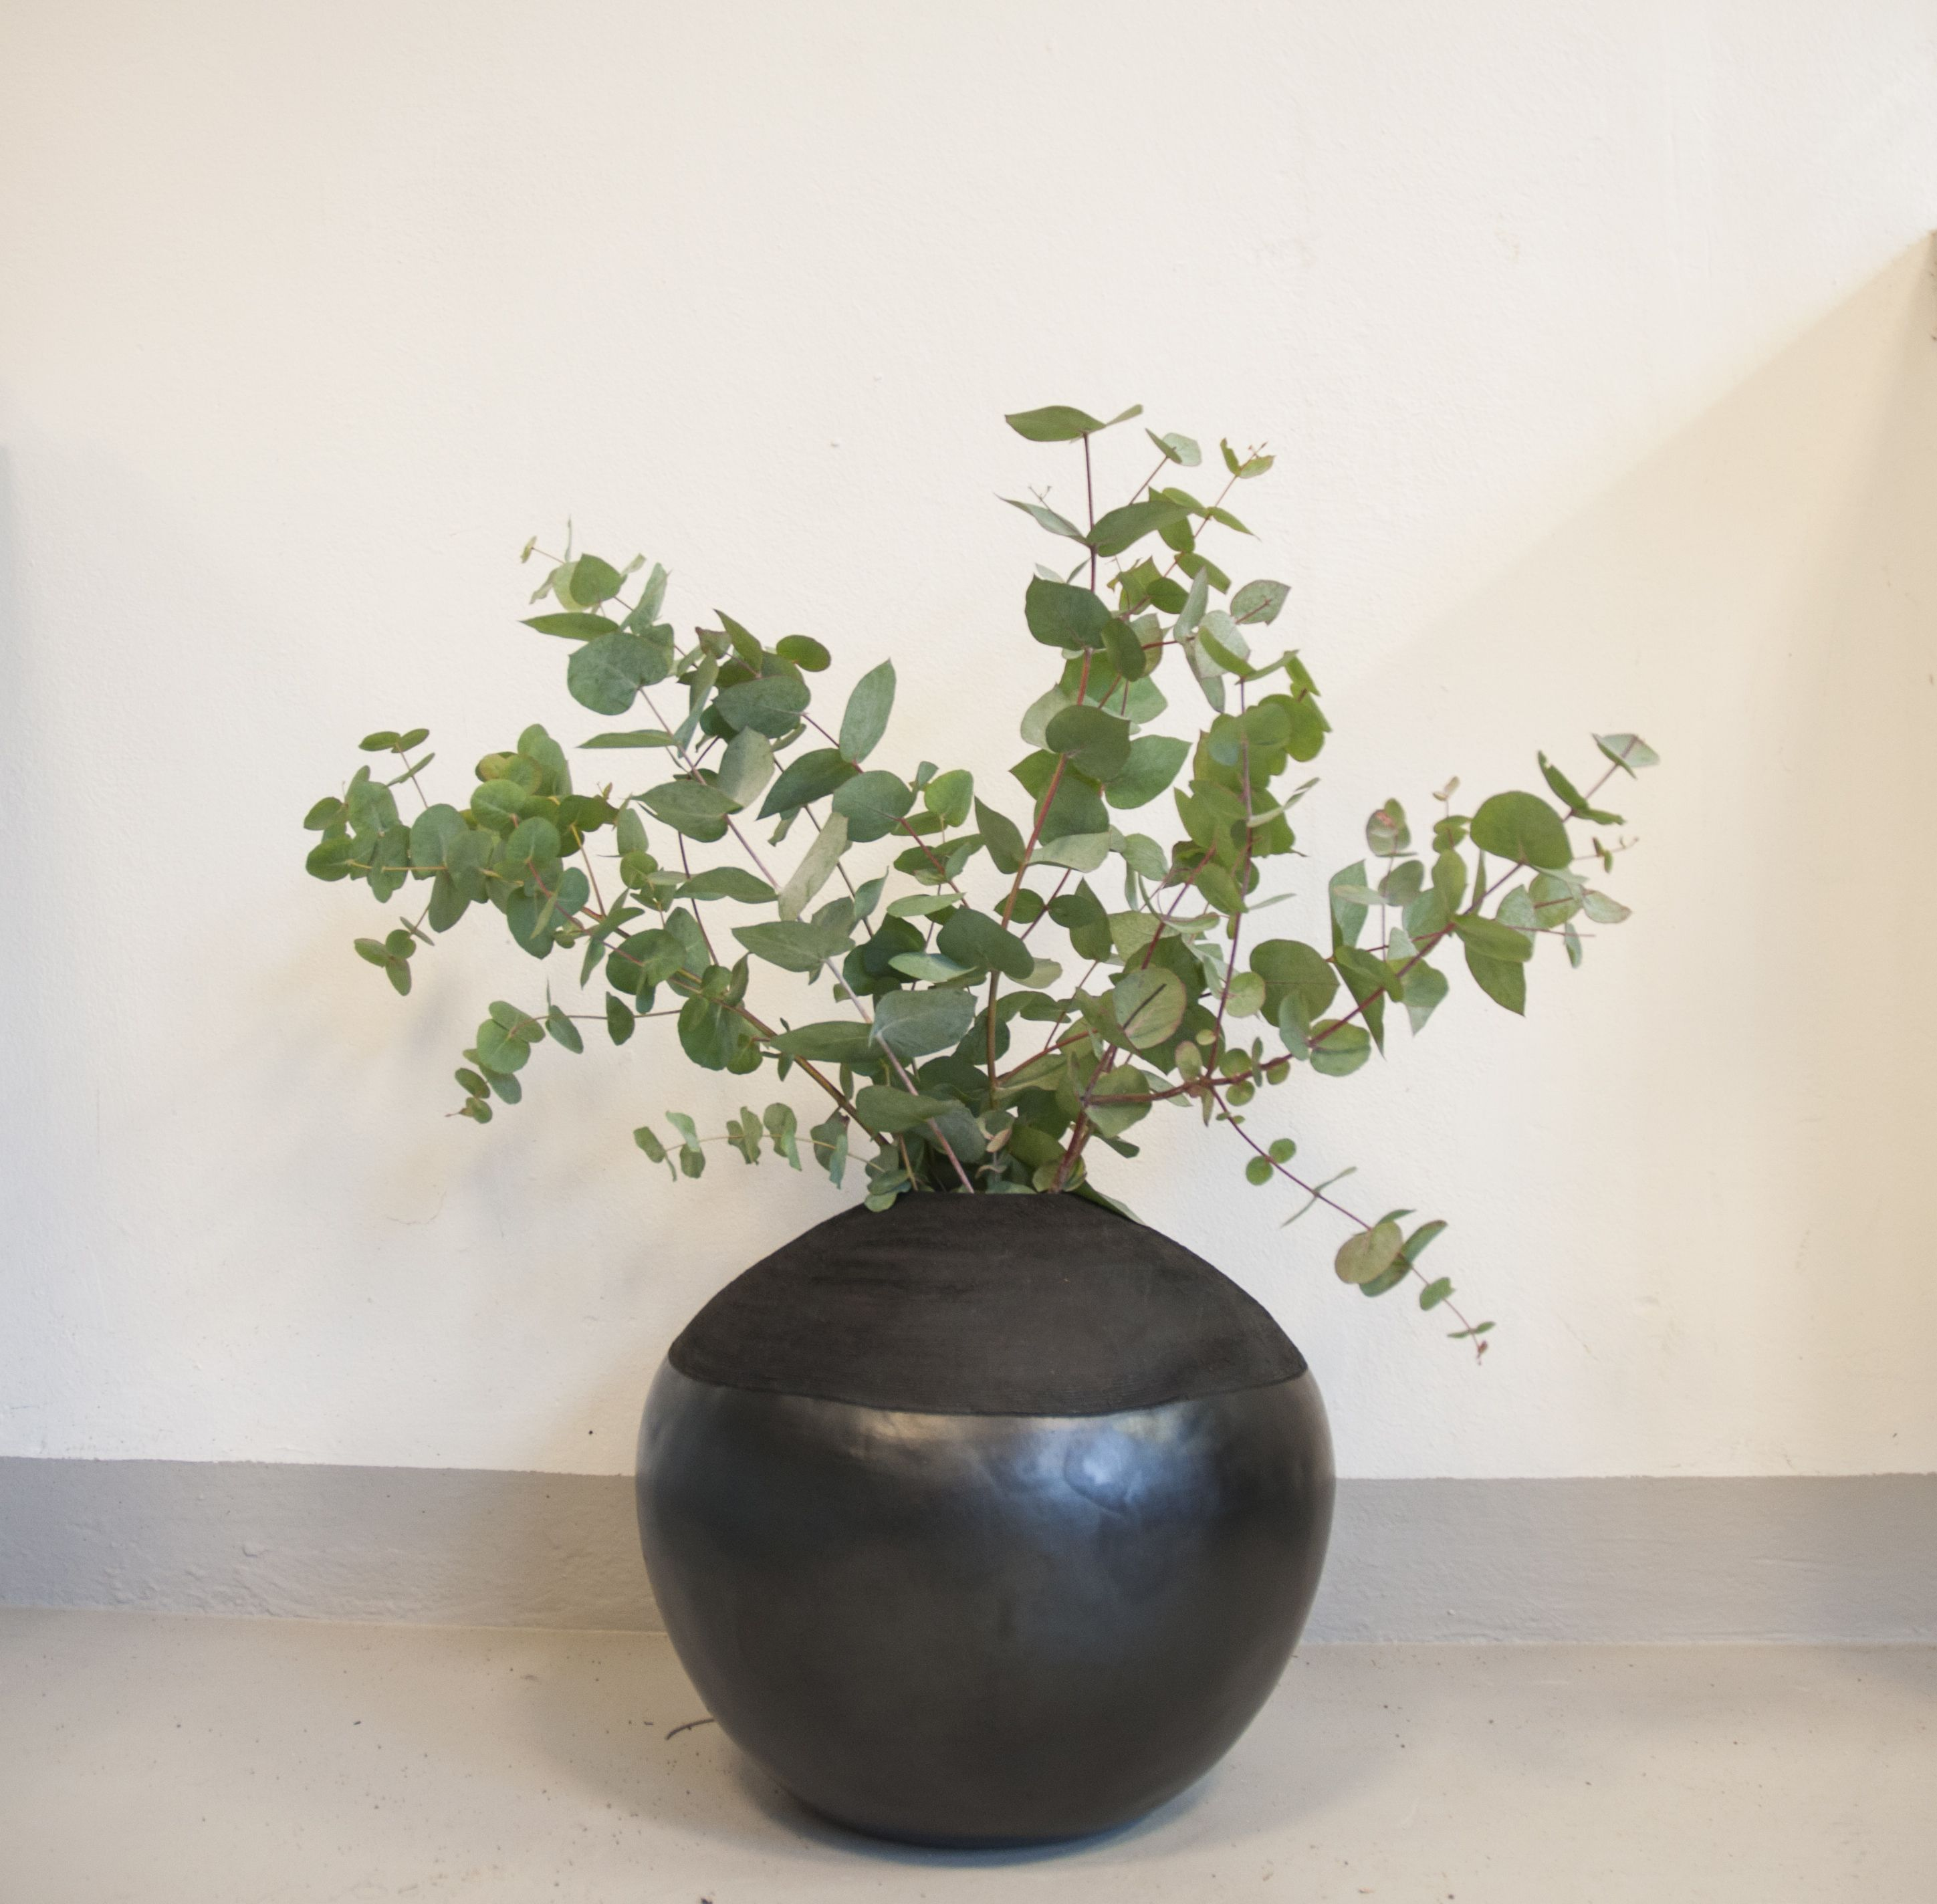 A Beautiful Chamba Vase With Eucalyptus